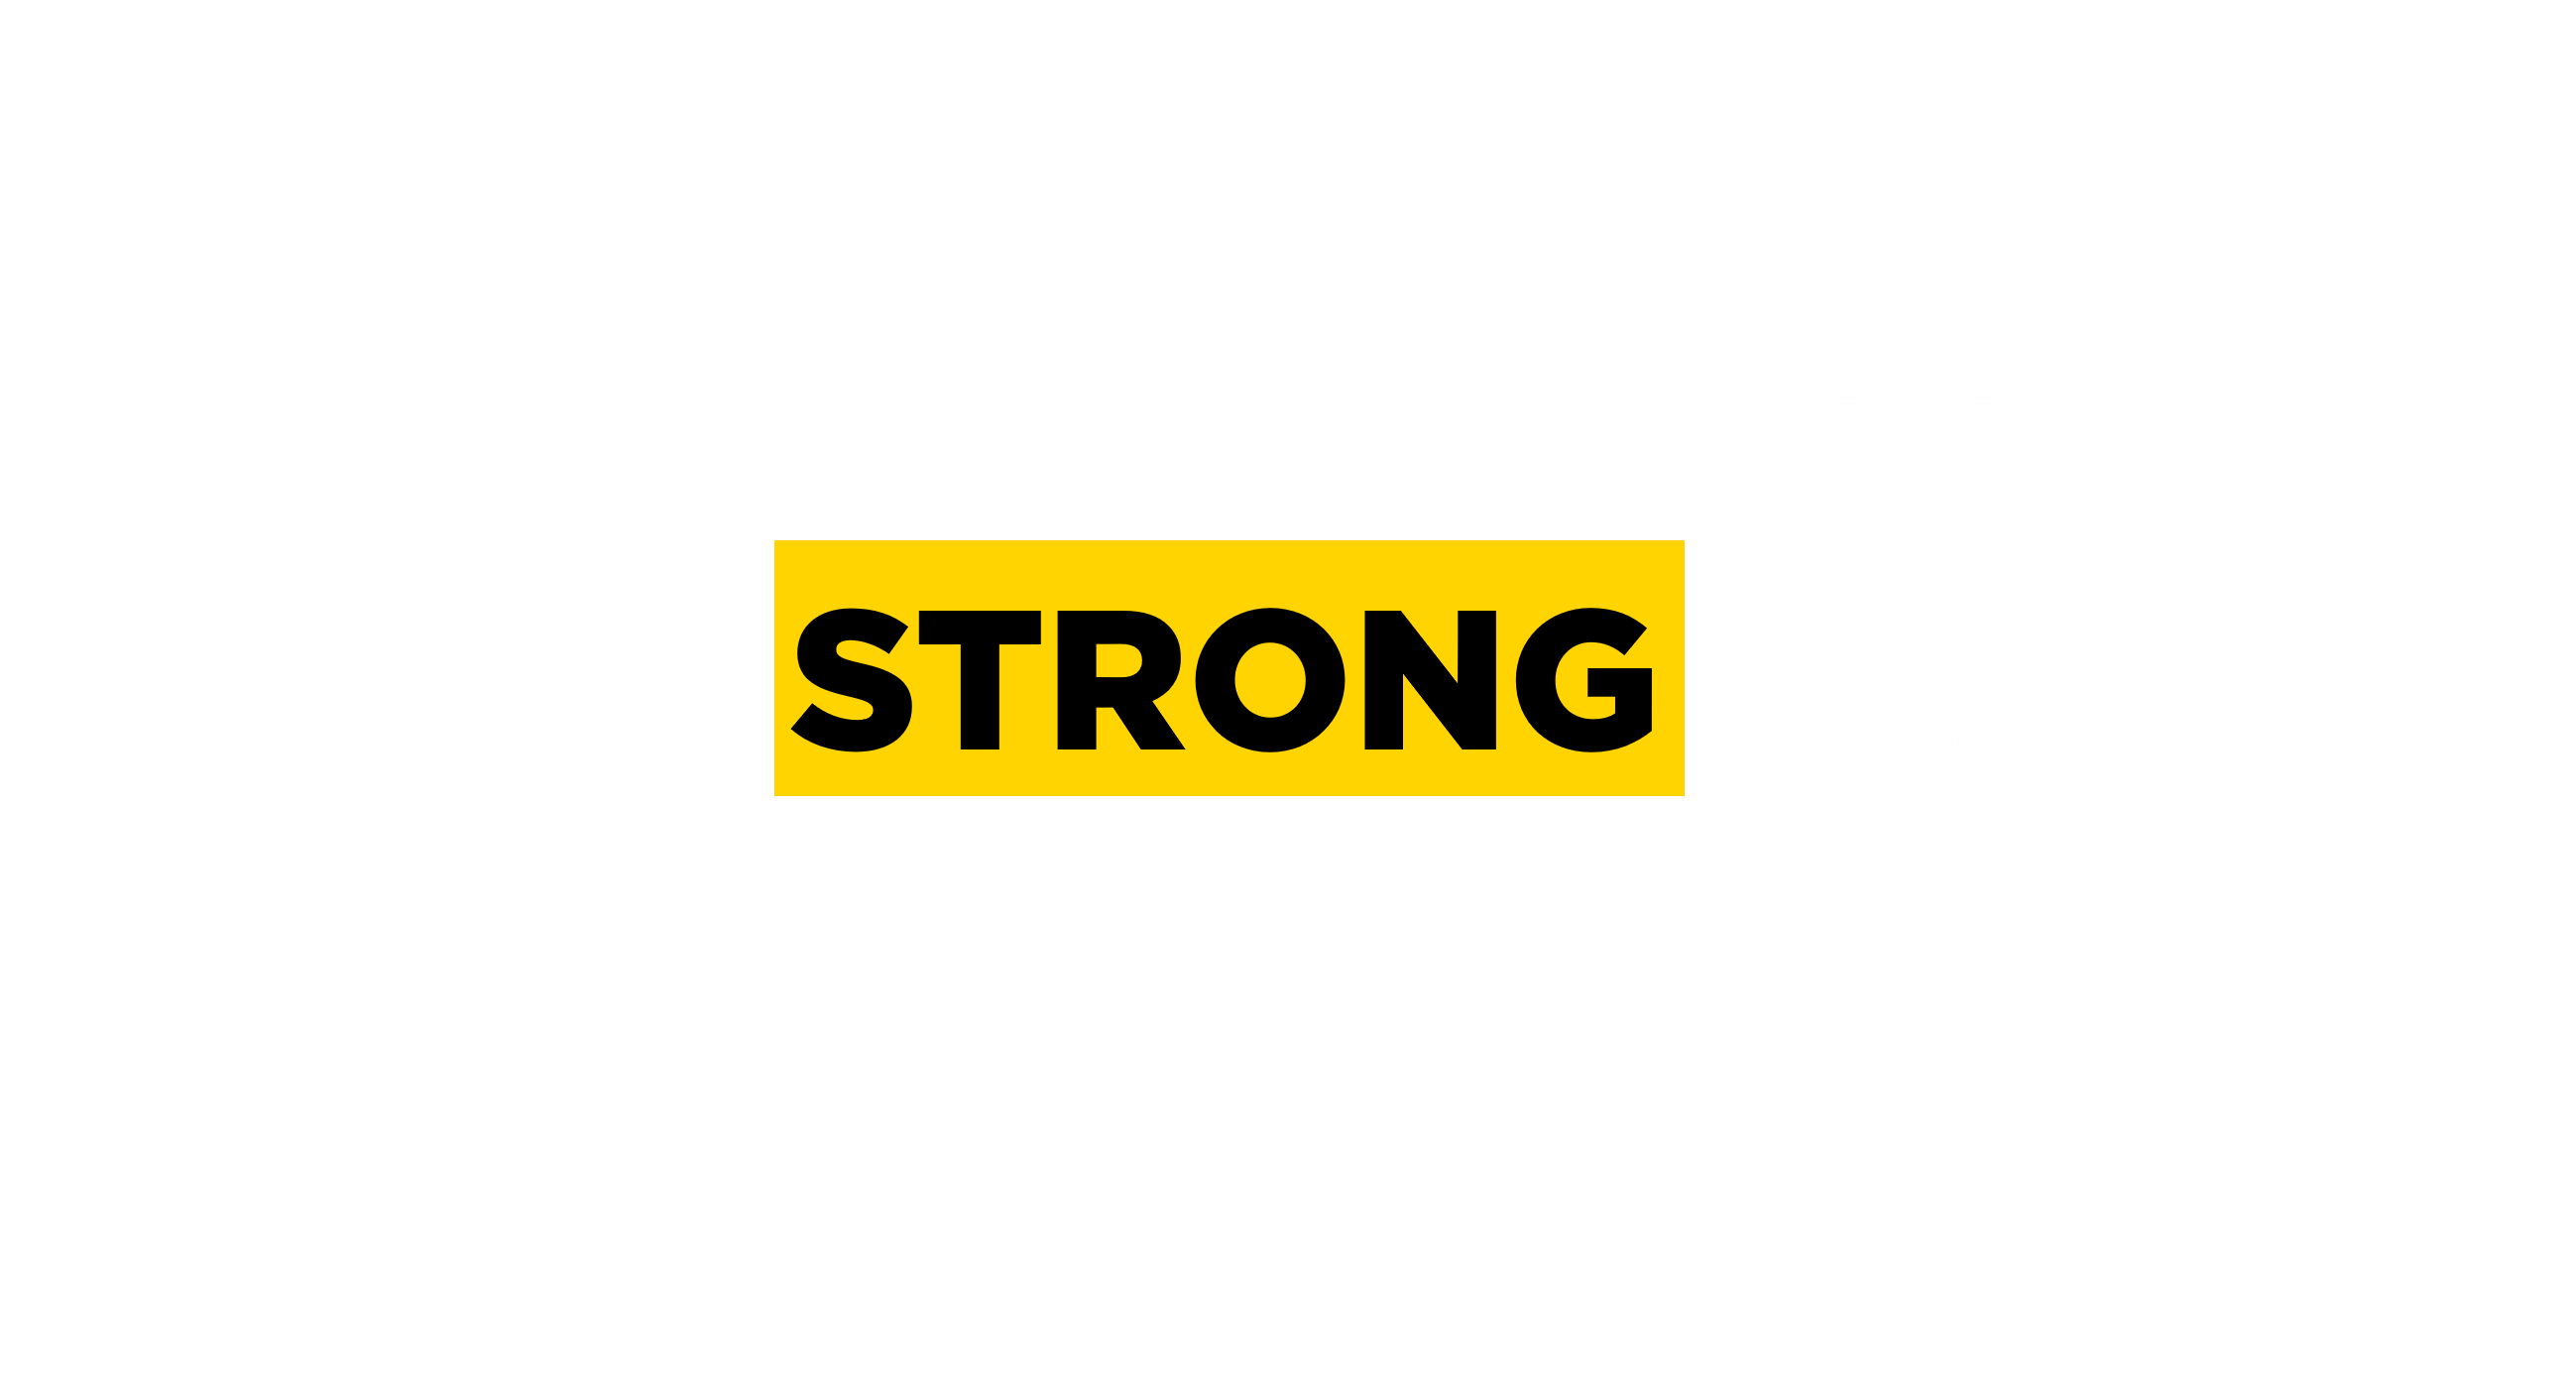 Word cloud with strong, mythology, innovative, European, international, trustworthy, real, pragmatic, smart, calm, balanced, technological, digital, resistant